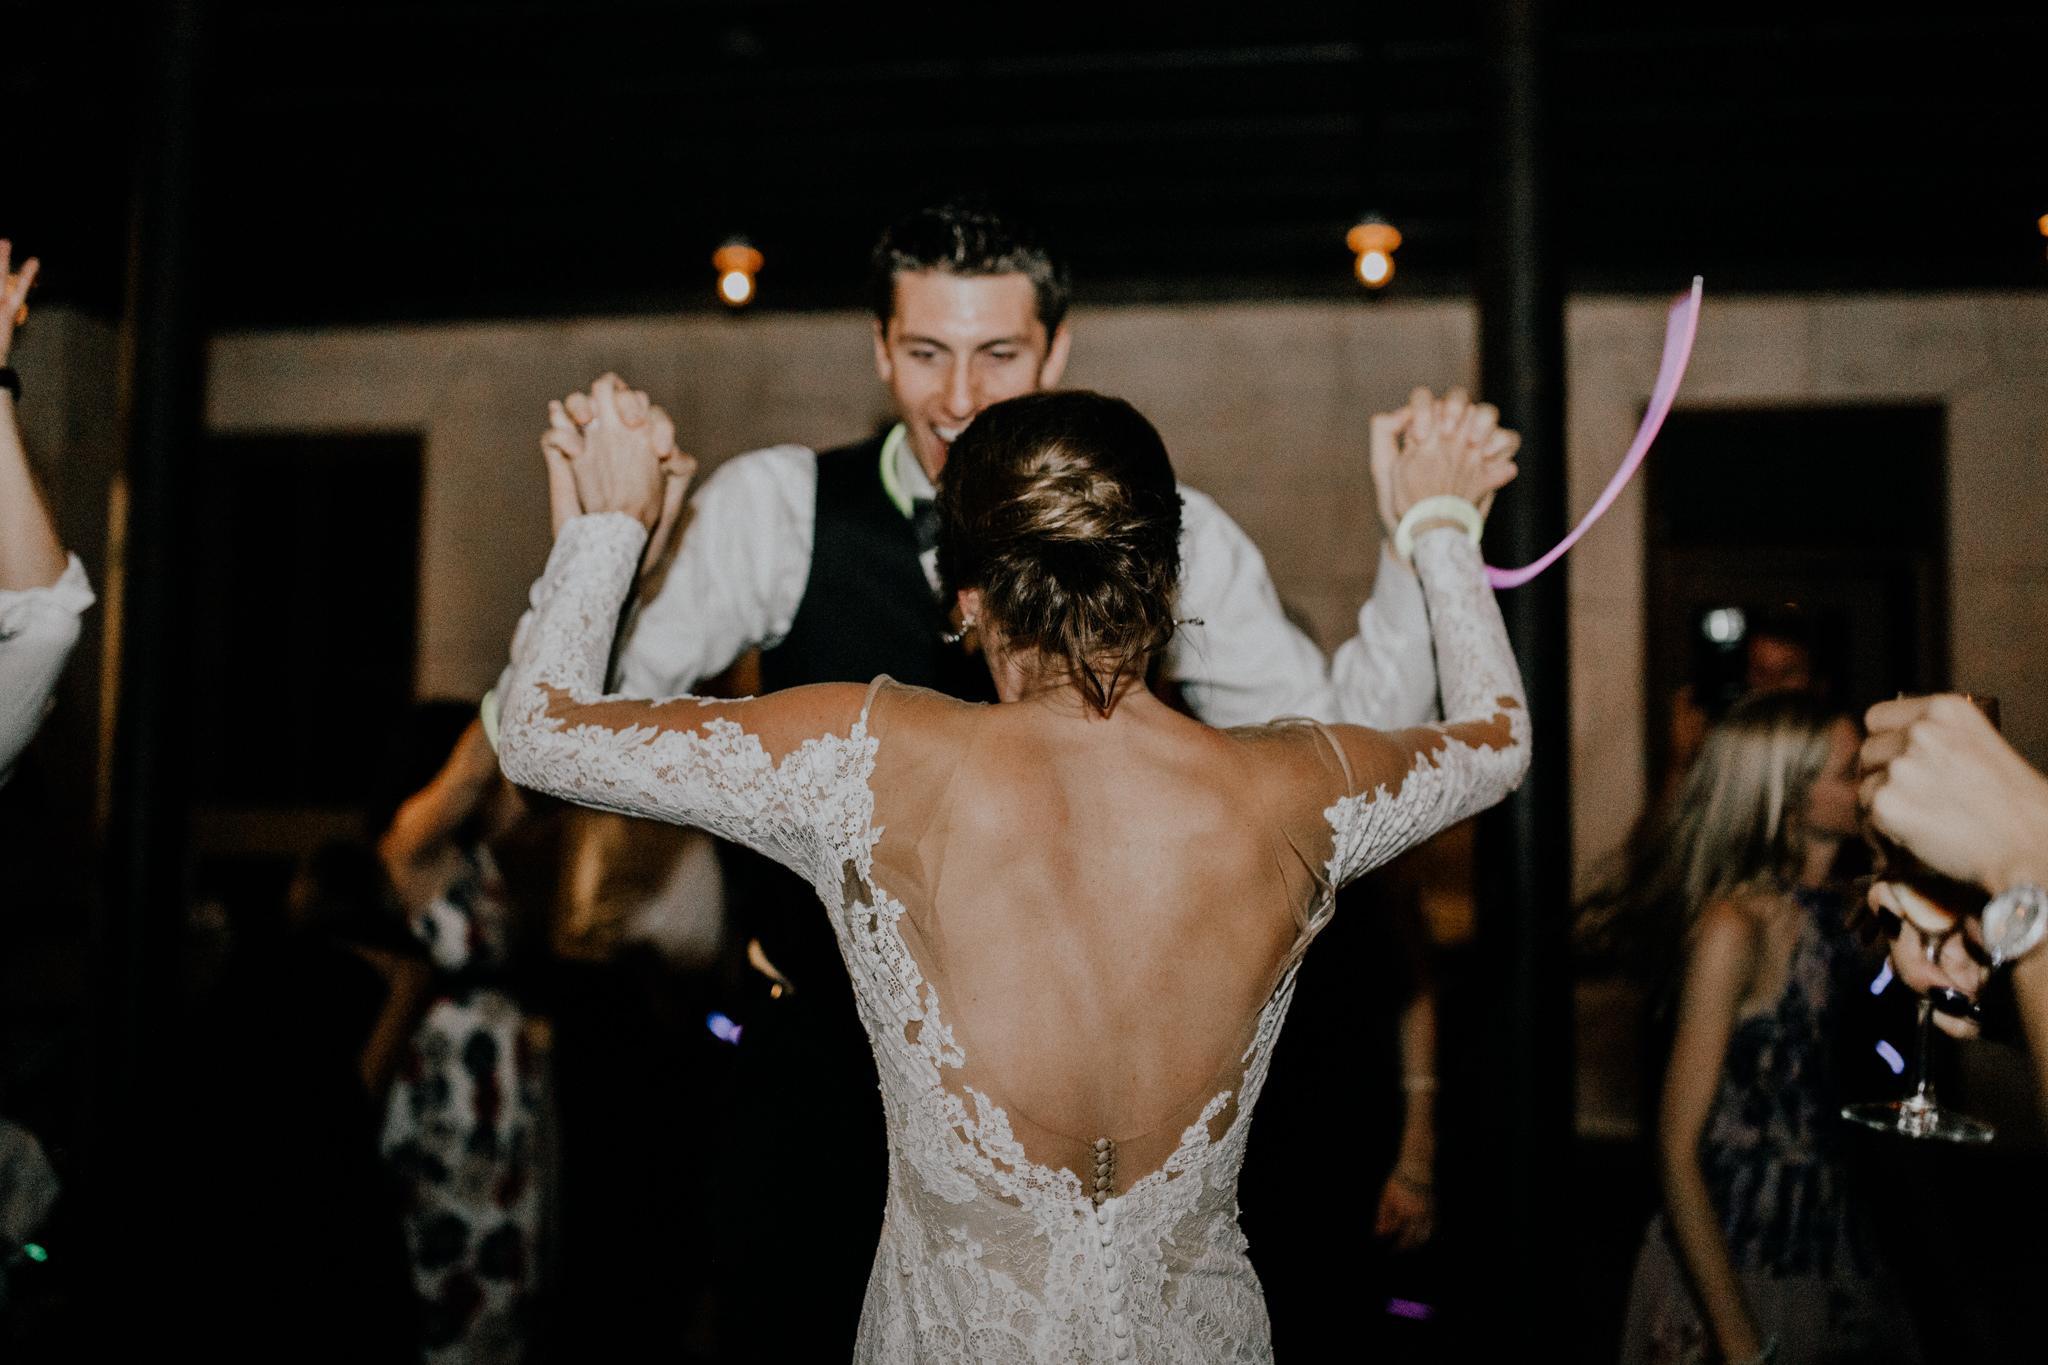 wedding-headlands-center-for-the-arts-sausalito-148.jpg